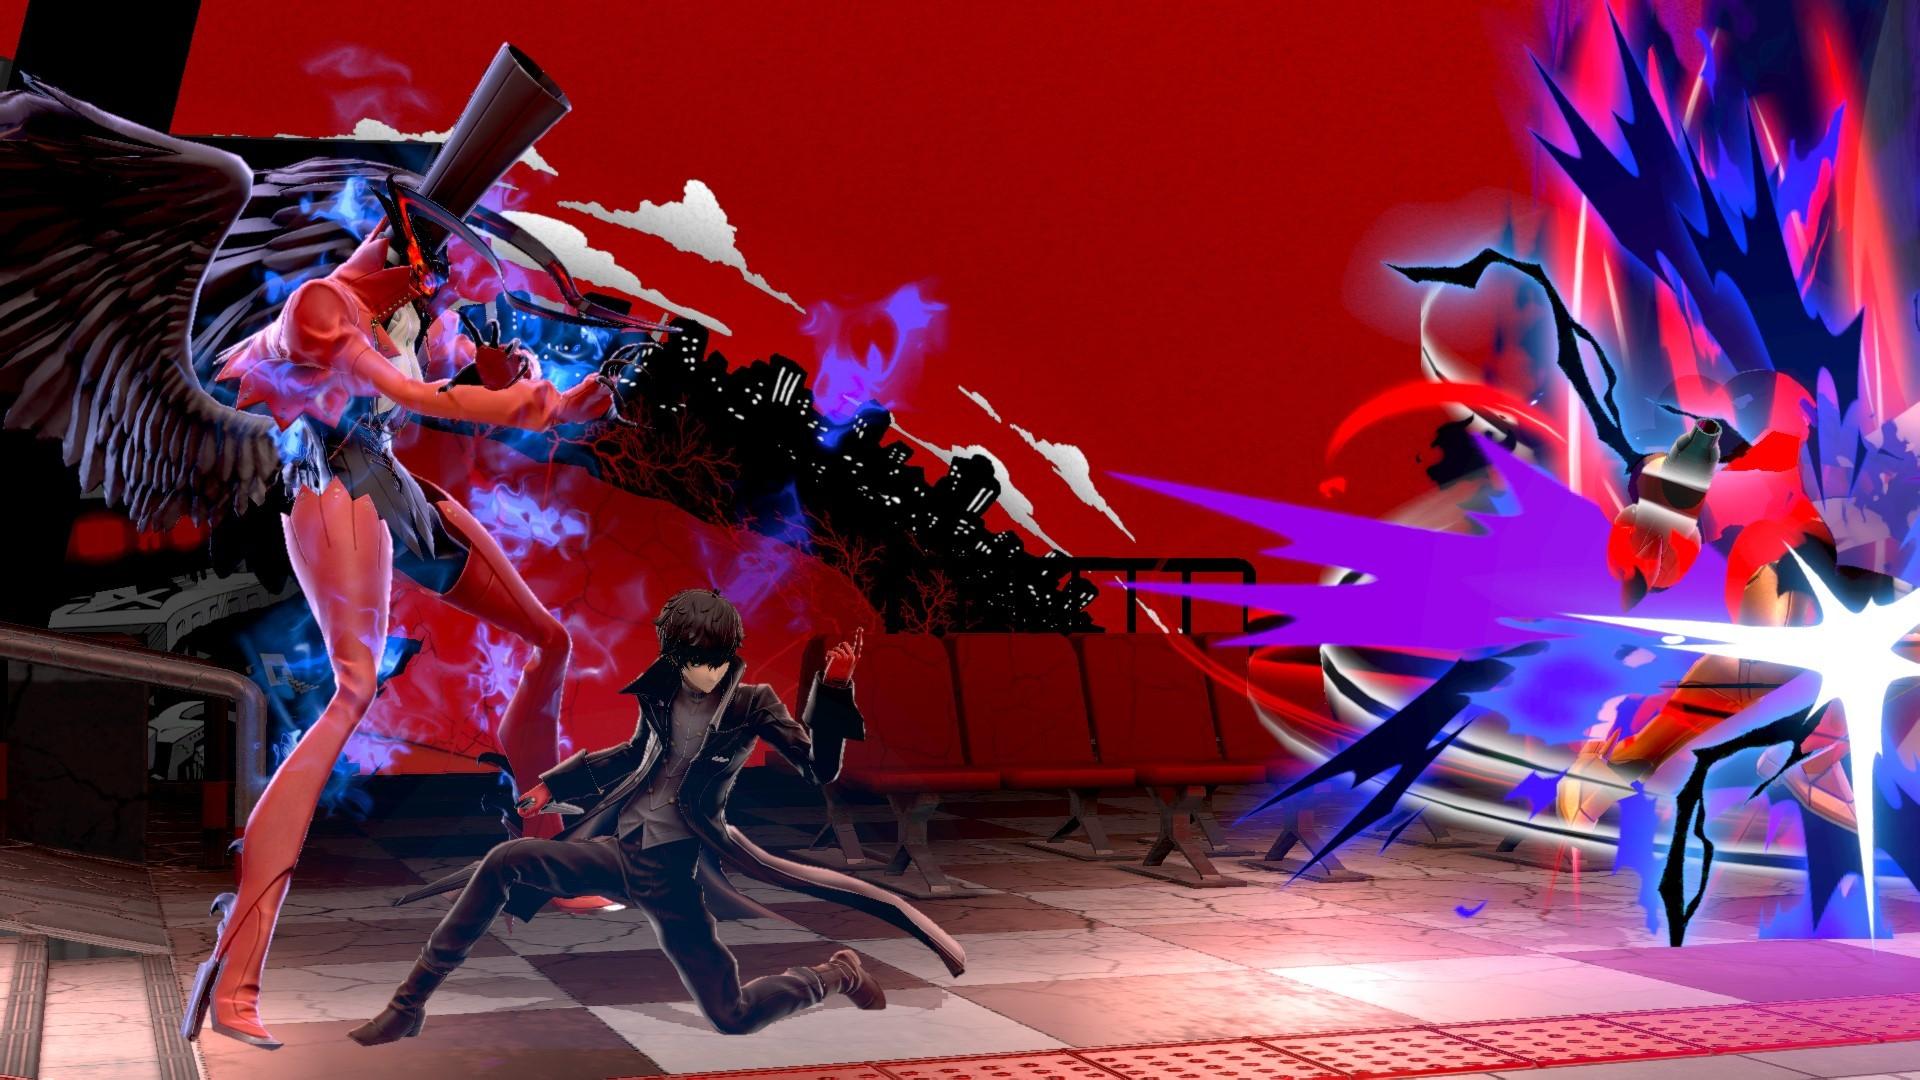 Super Smash Bros Ultimate Gets Vr Mode With 3 1 0 Update